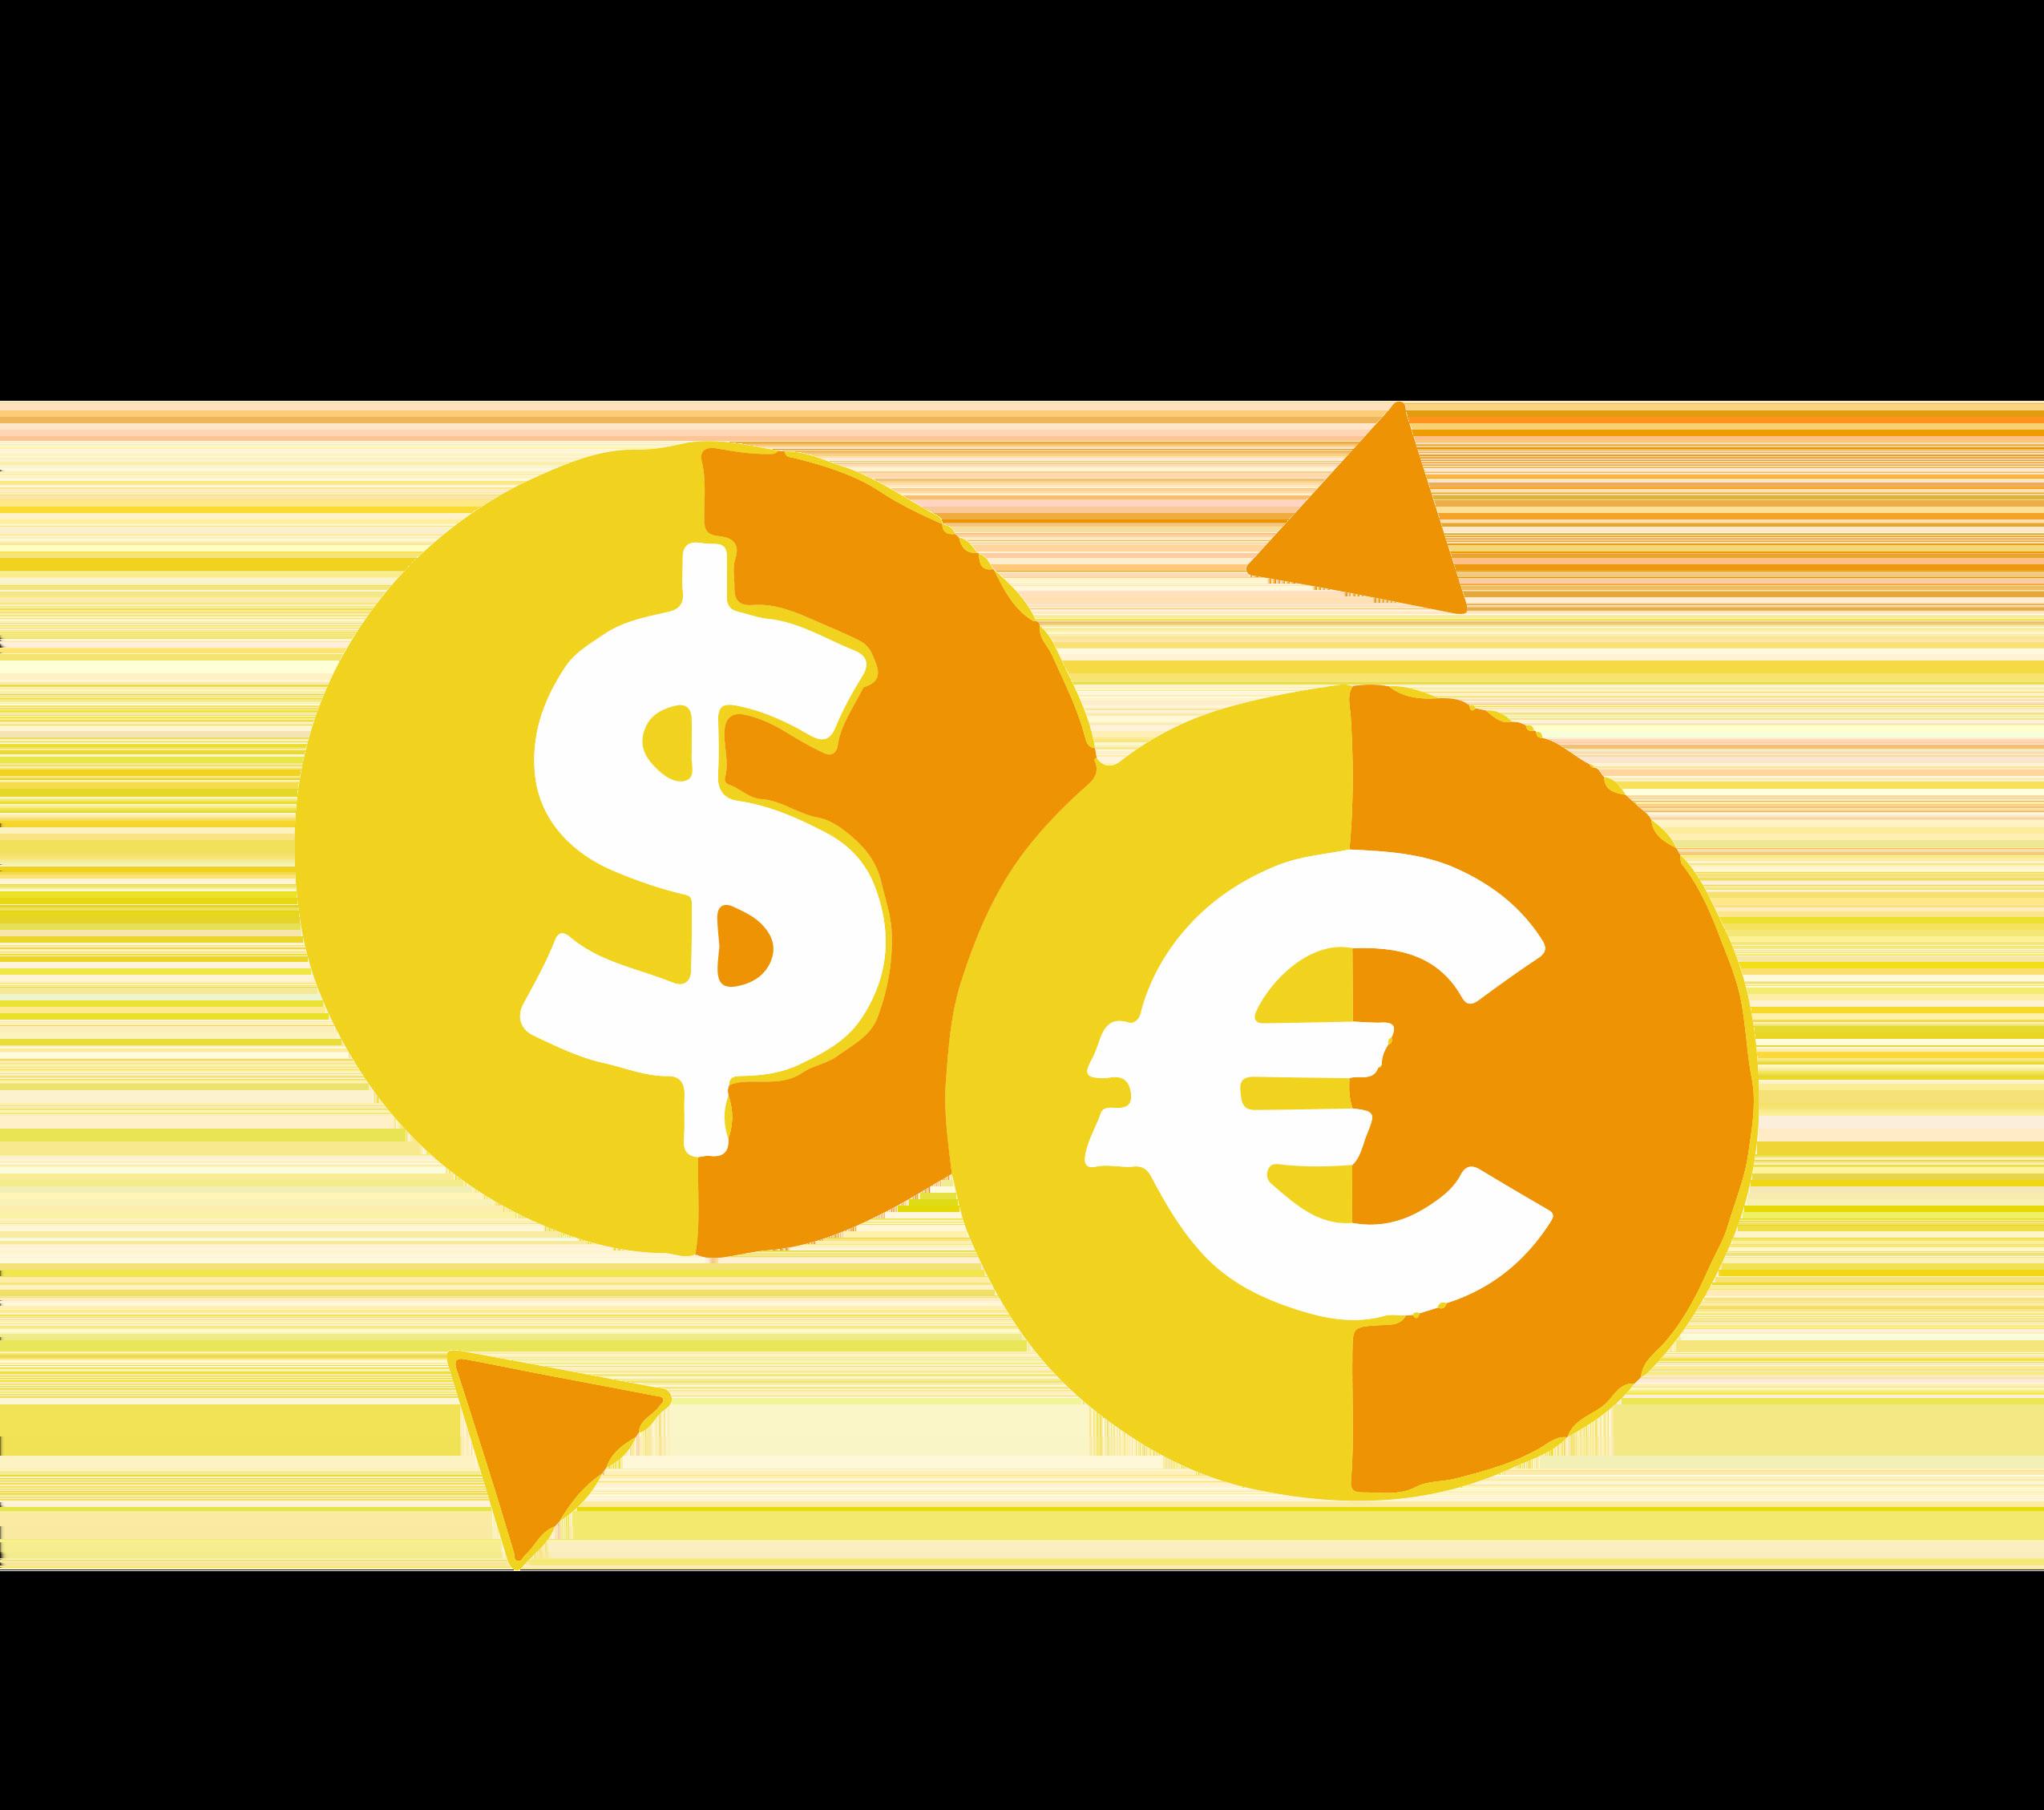 conversao monetaria